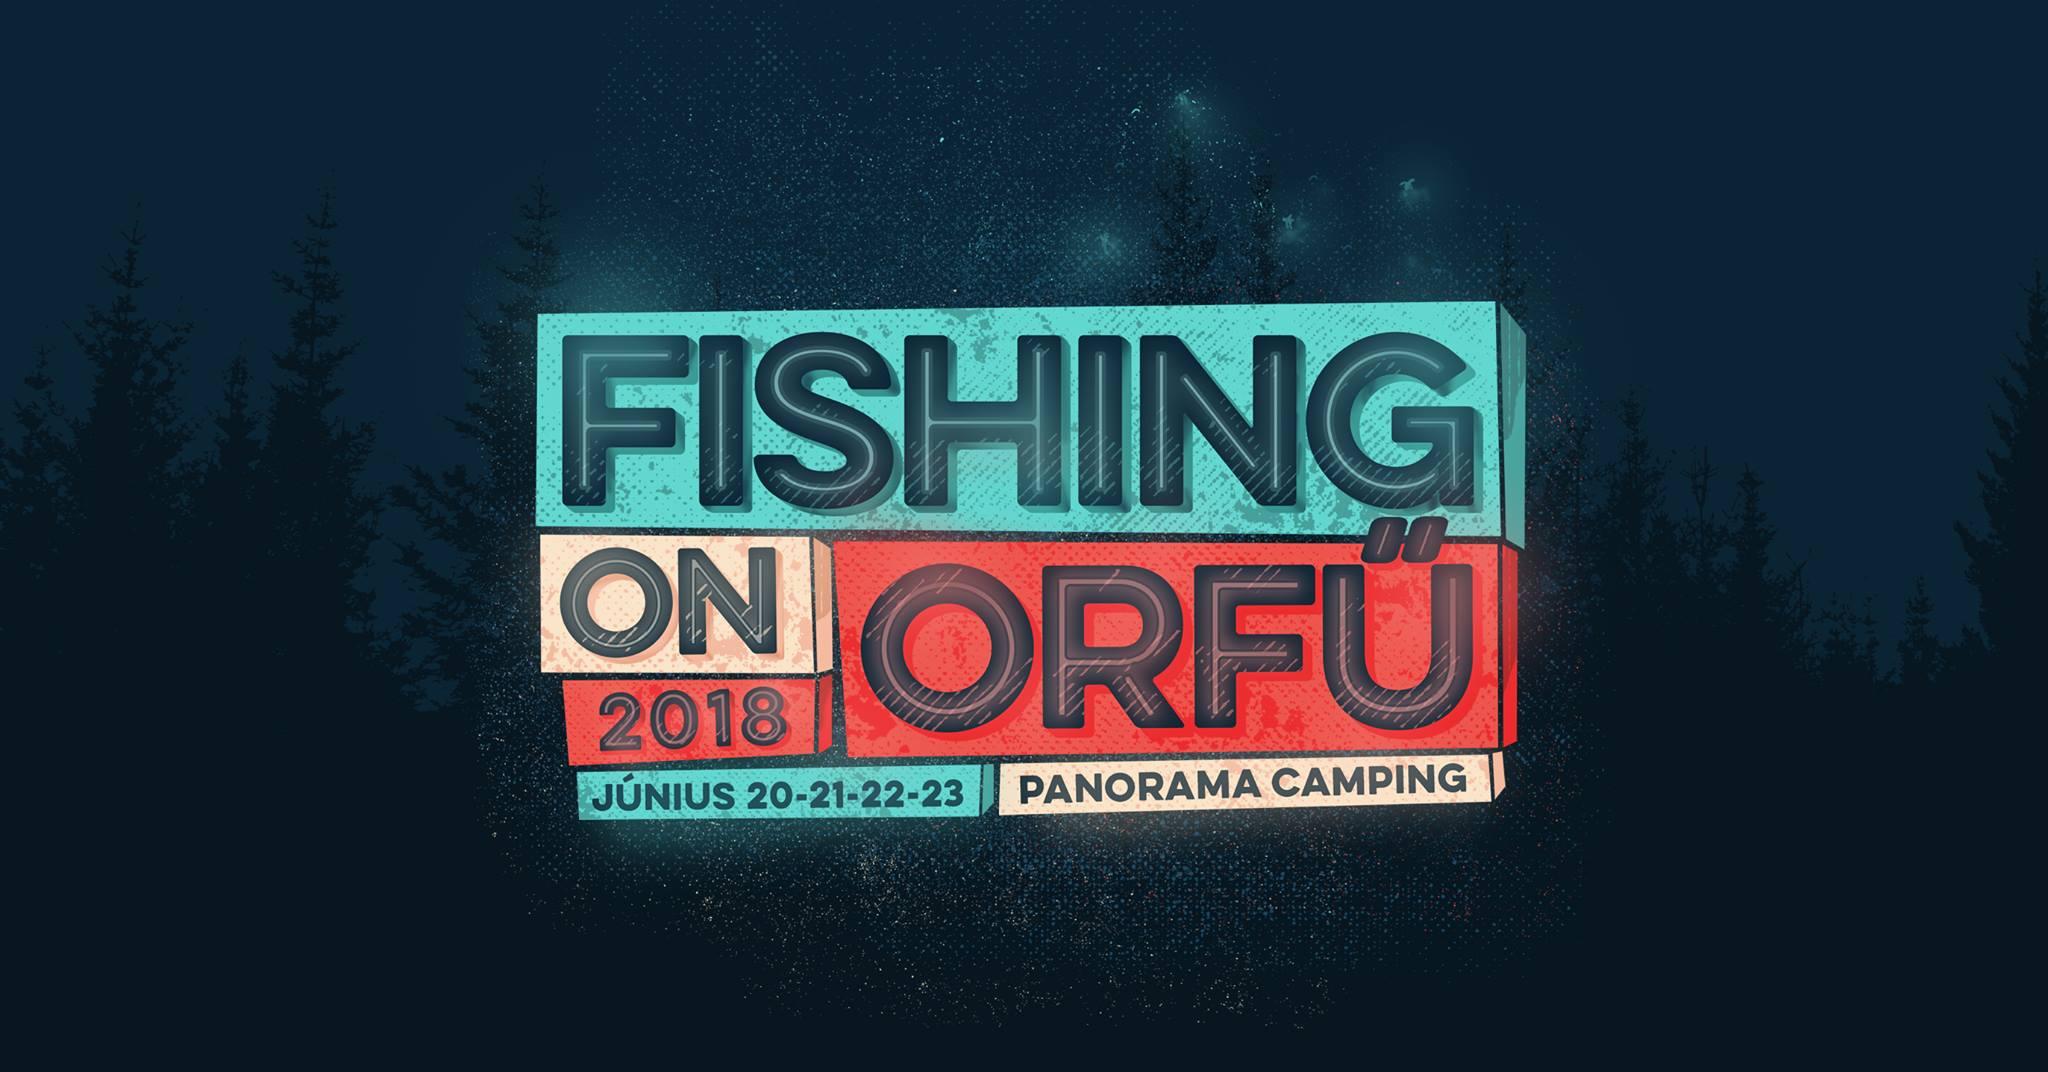 Vera Jonas concert - Fishing on Orfű - 21. June